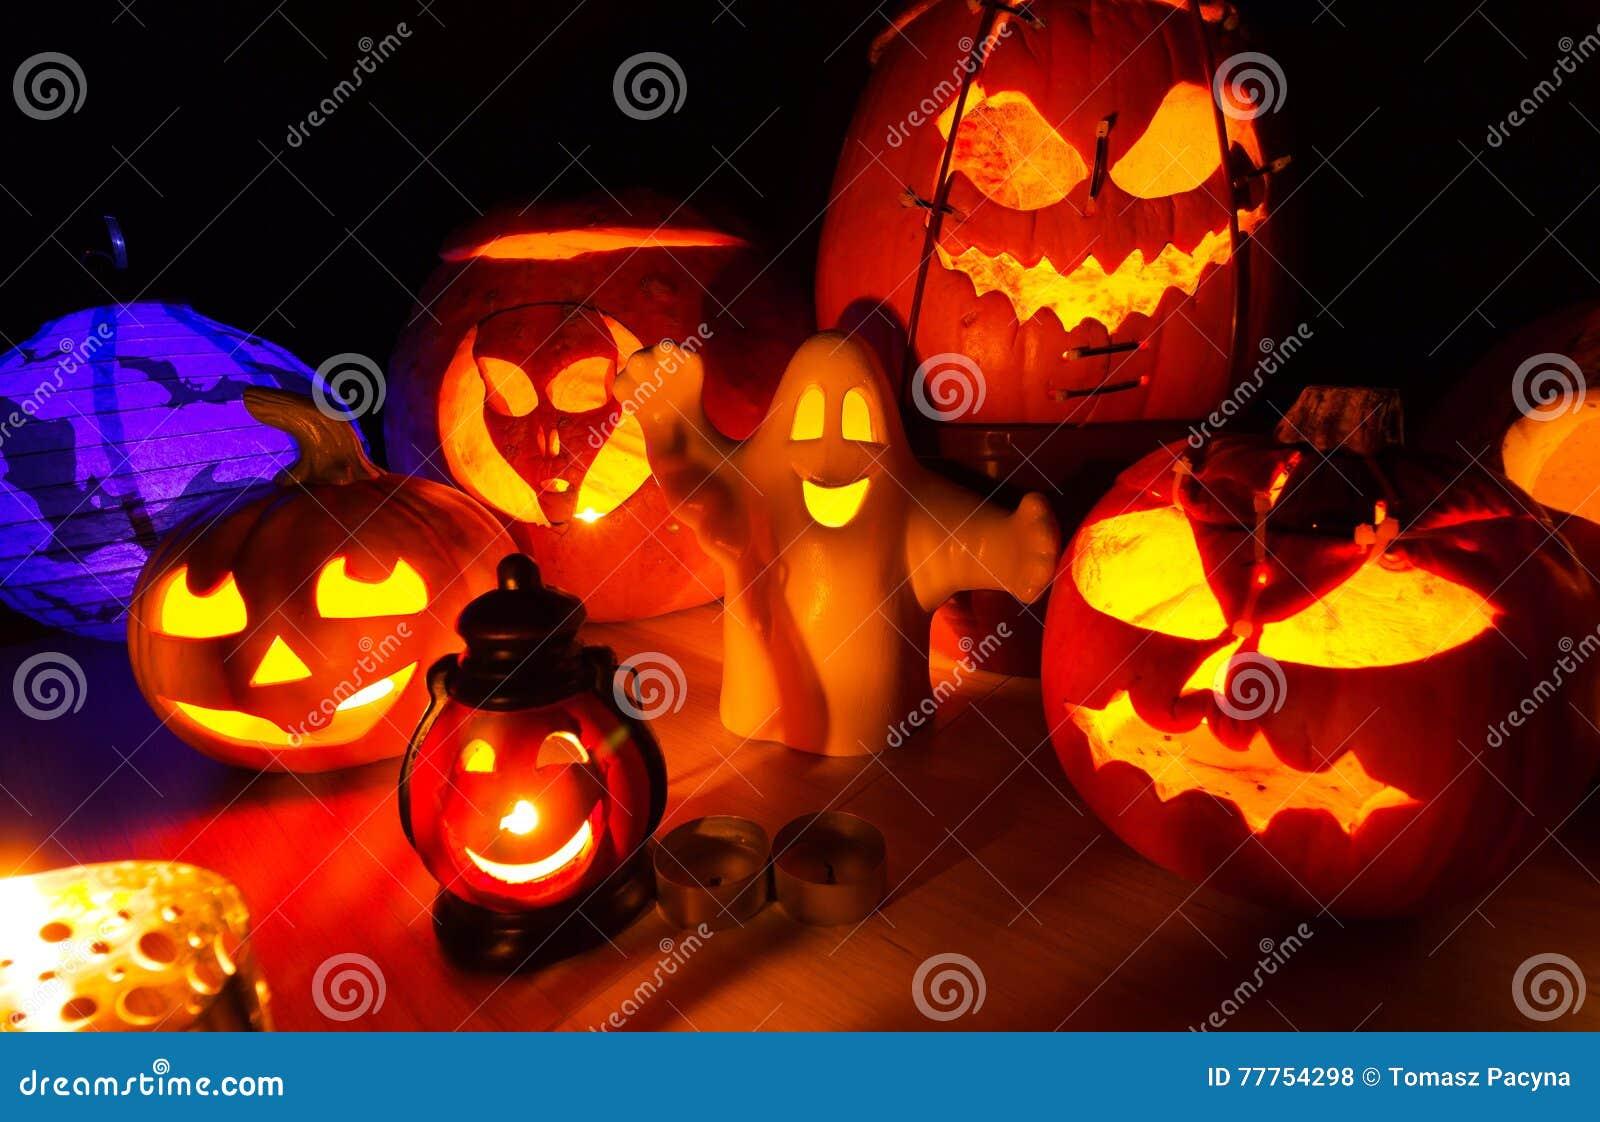 Cute Halloween Pumpkins At Night - Halloween Party Background ...